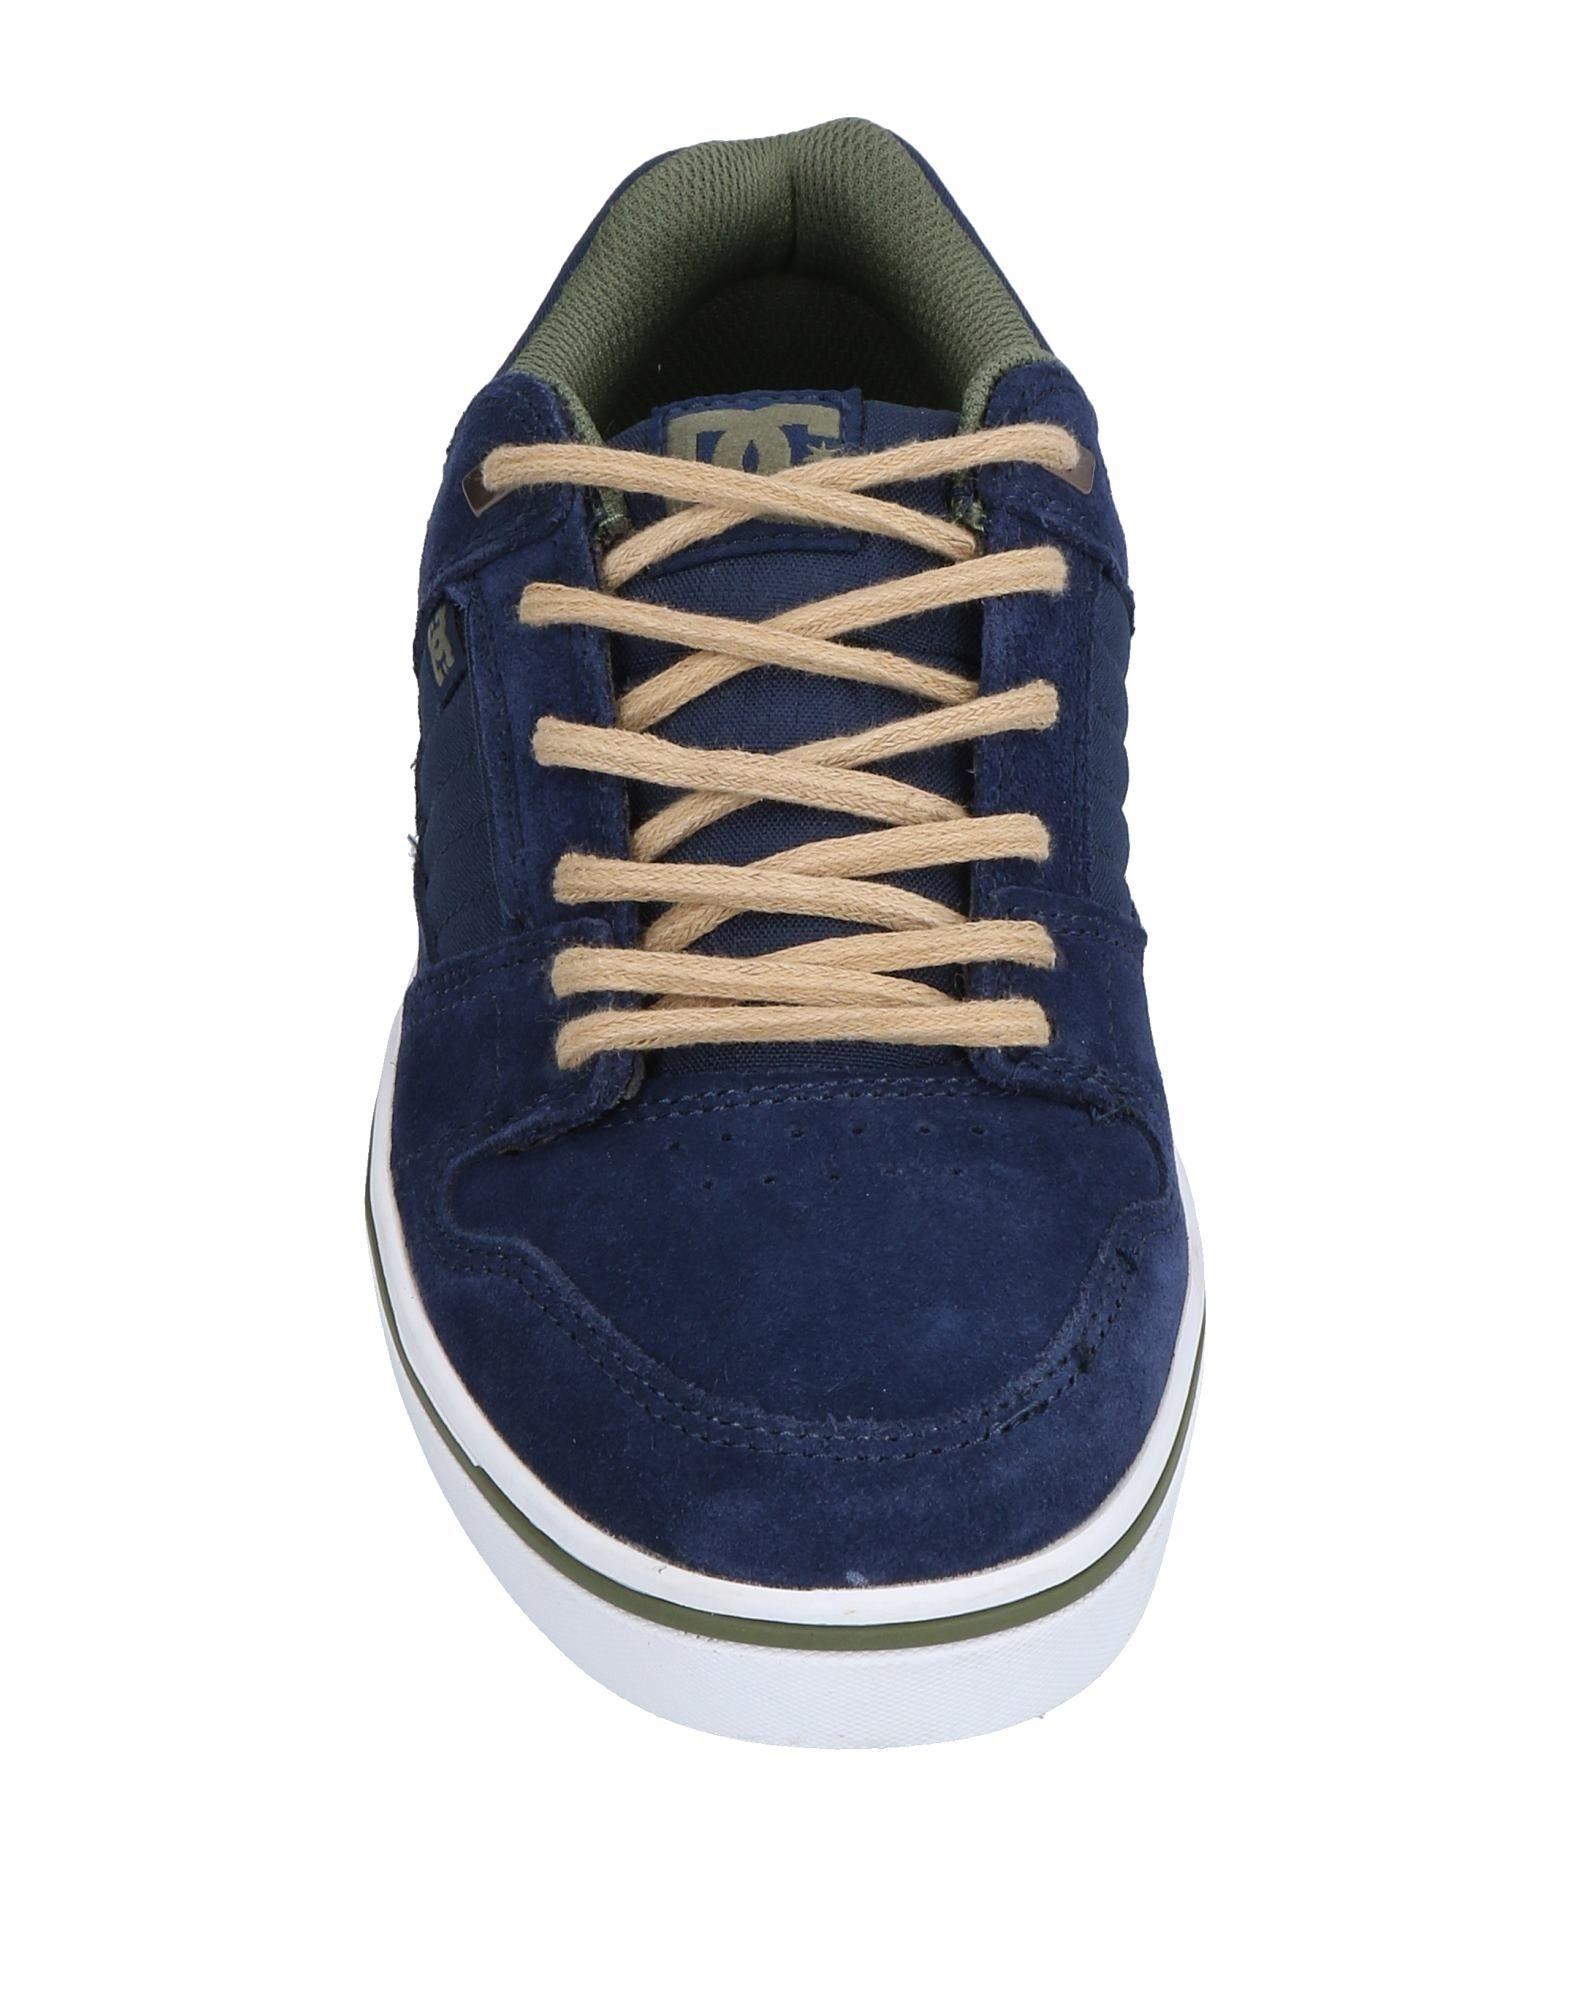 Rabatt echte 11509646MF Schuhe Dc Shoecousa Sneakers Herren  11509646MF echte d2362b